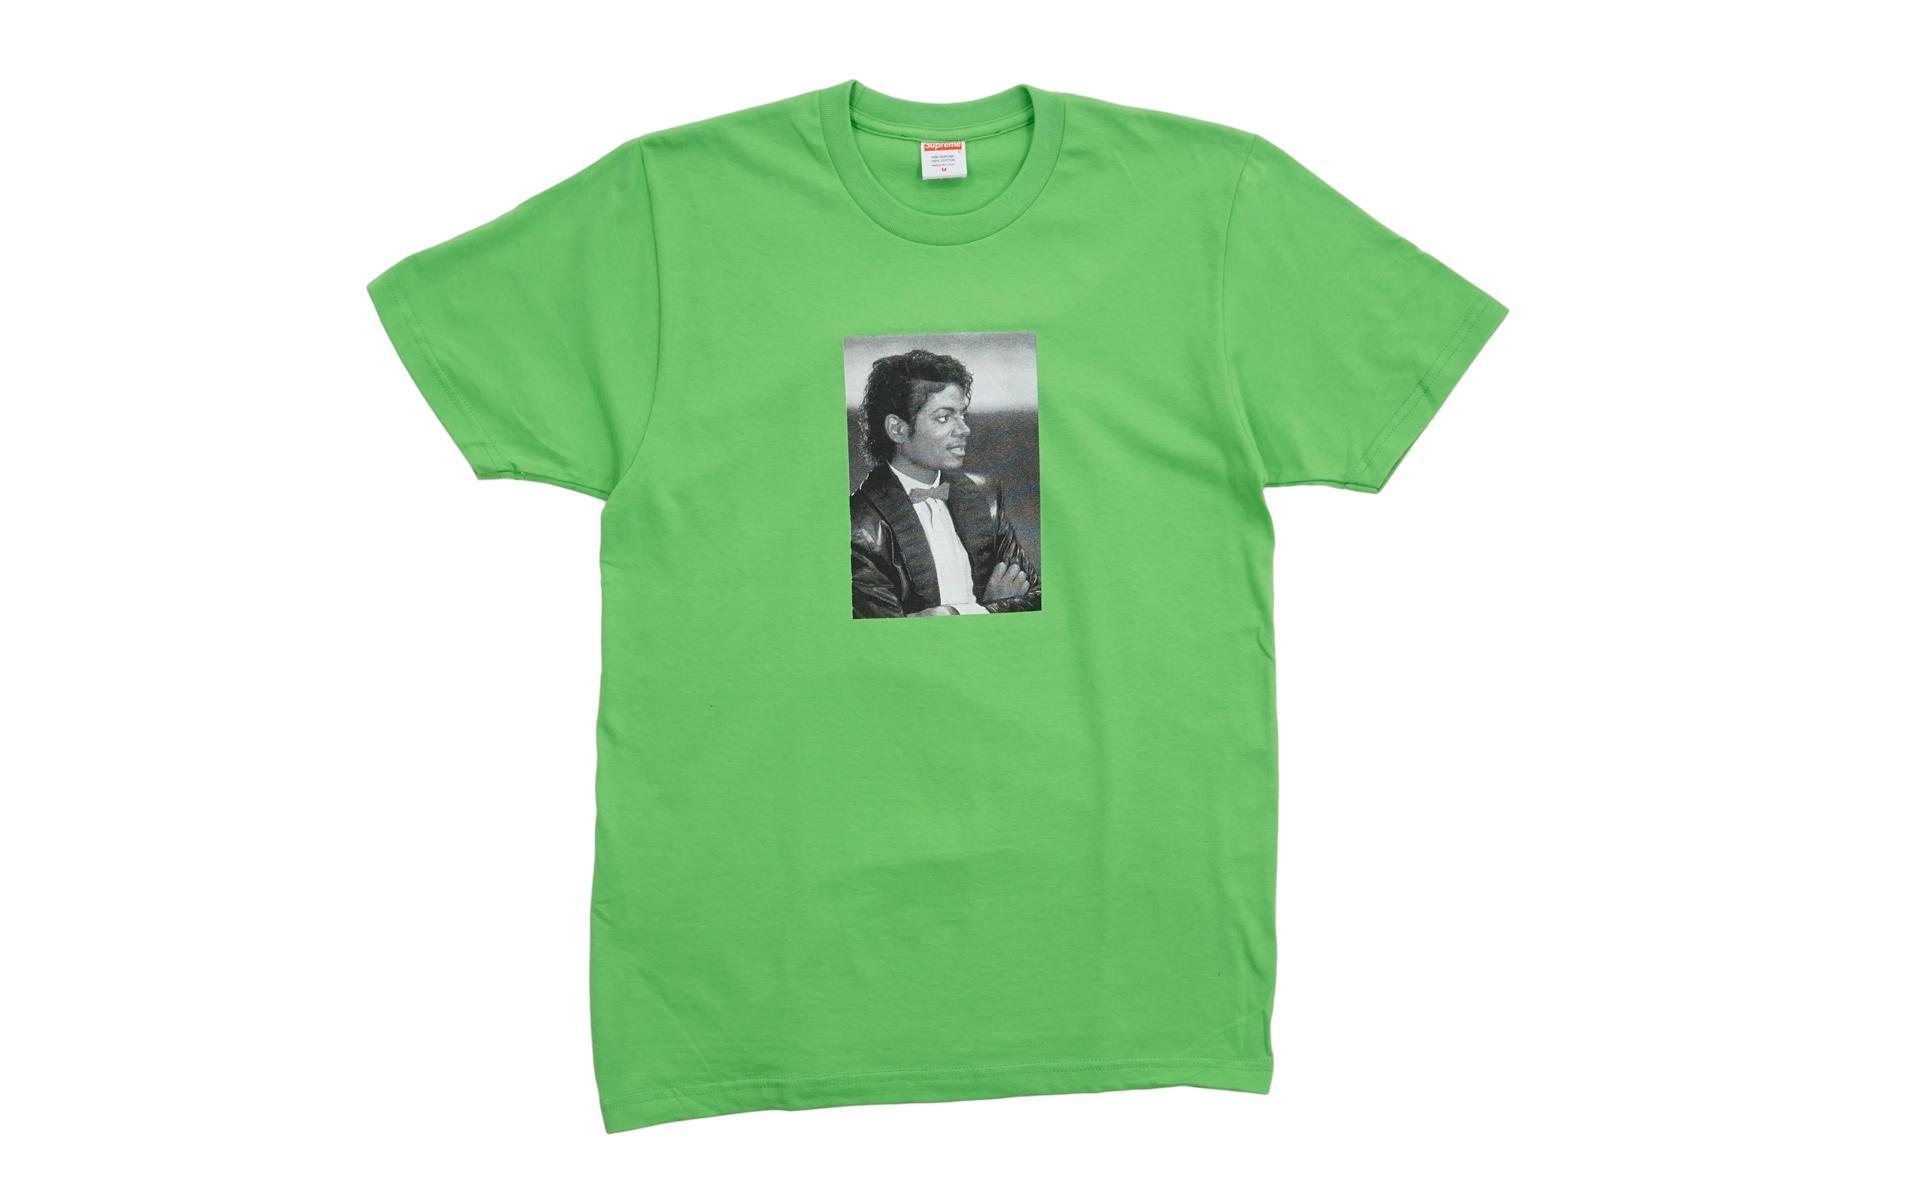 dfdb48d42cf Supreme - Michael Jackson Tee Lime Green for Men - Lyst. View fullscreen